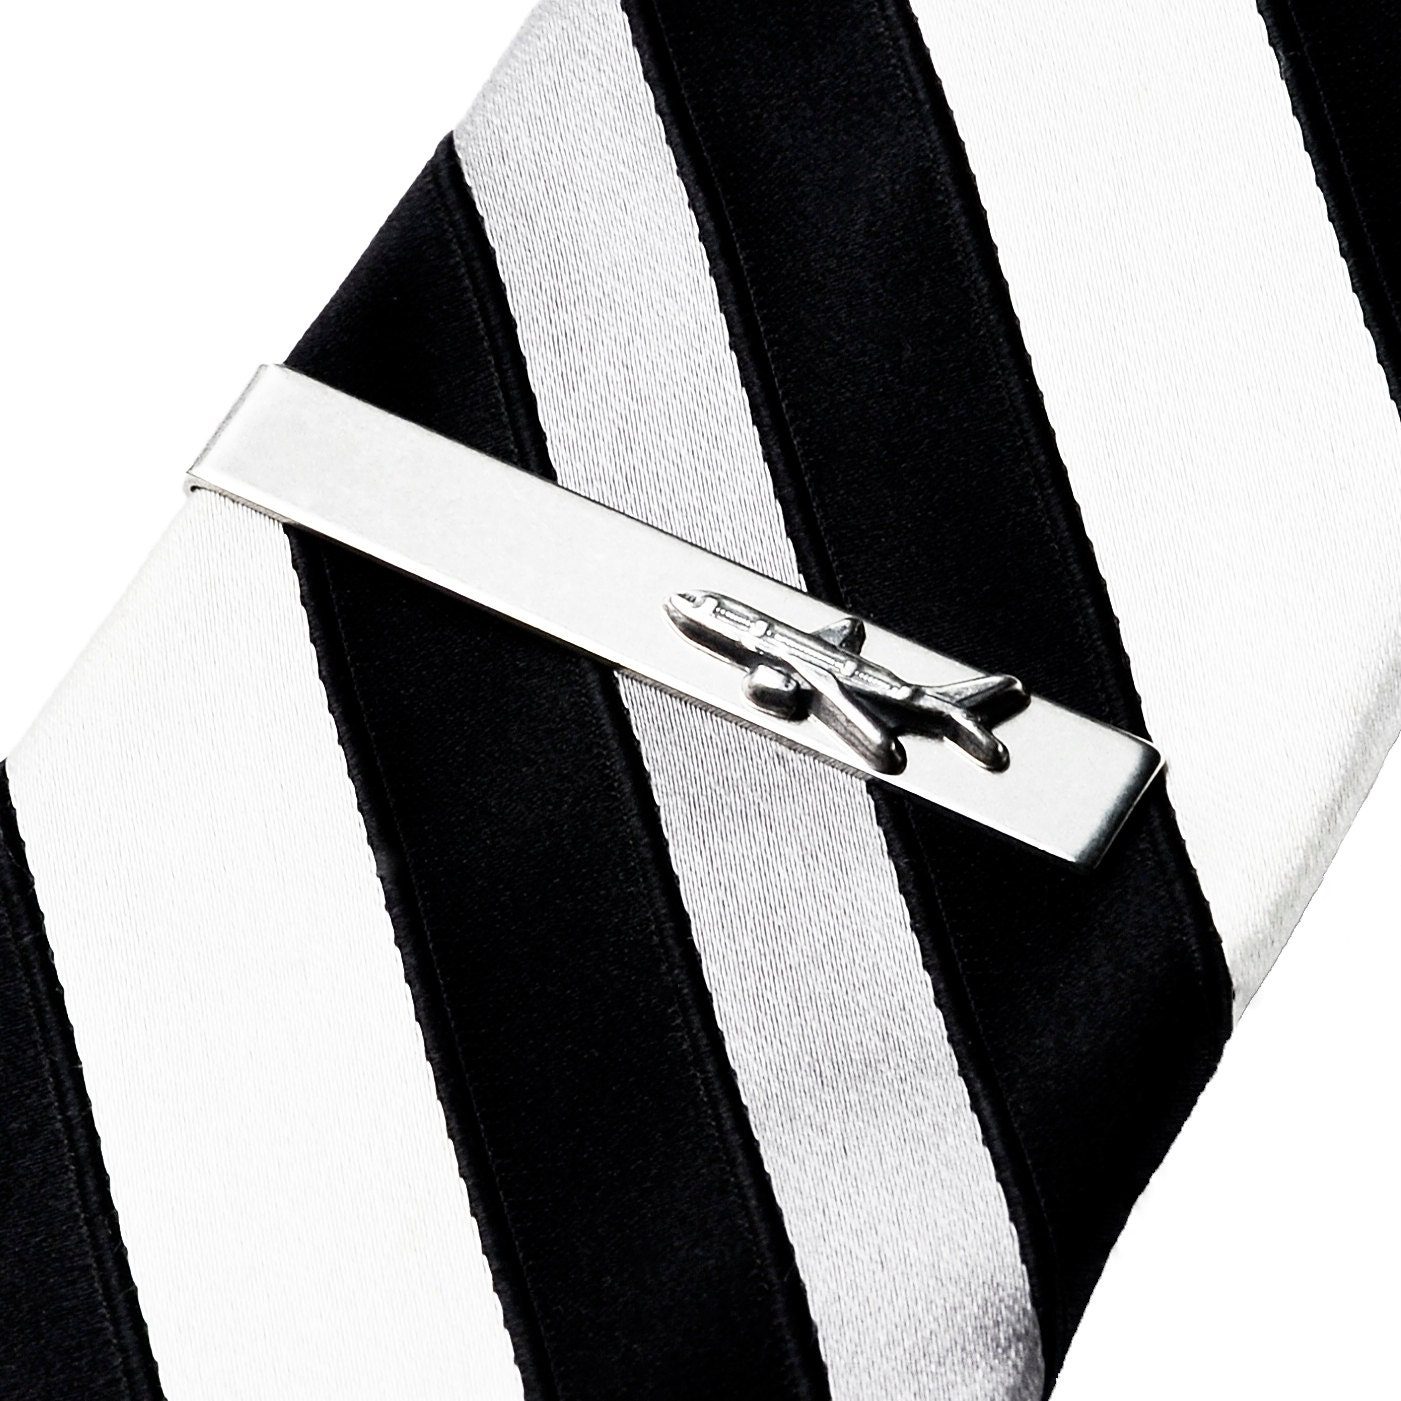 airplane tie clip tie bar tie clasp business gift by mancornas